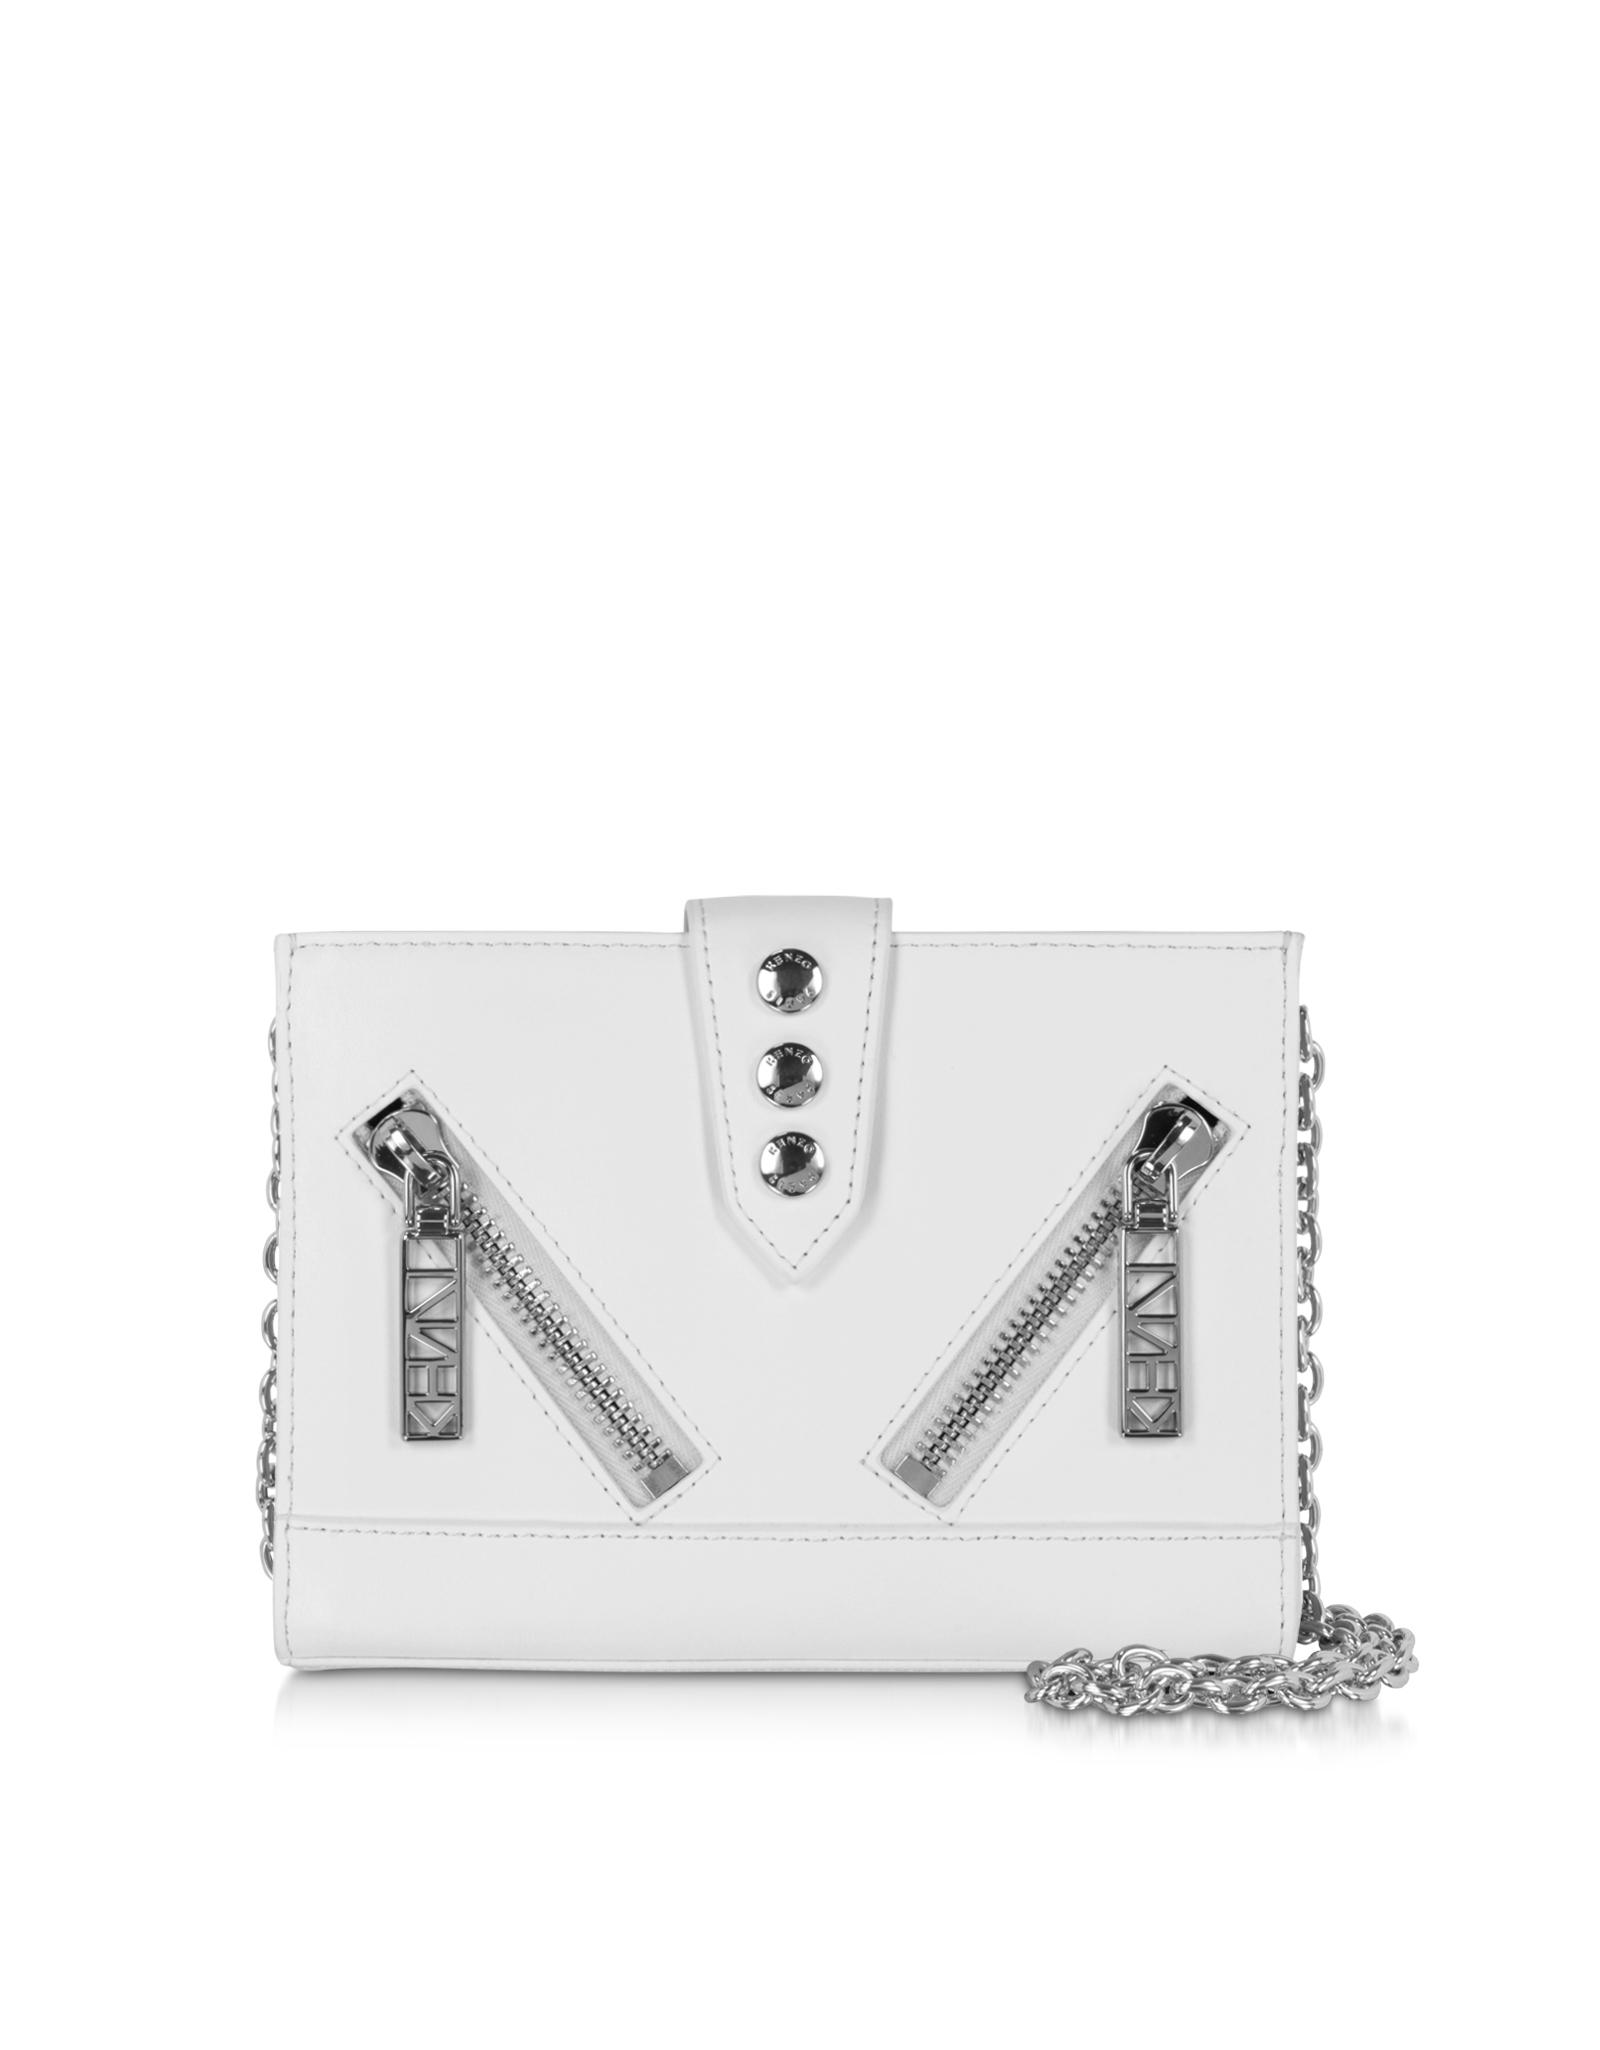 264263b29f2 KENZO Kalifornia Leather Wallet W/chain Strap in White - Lyst